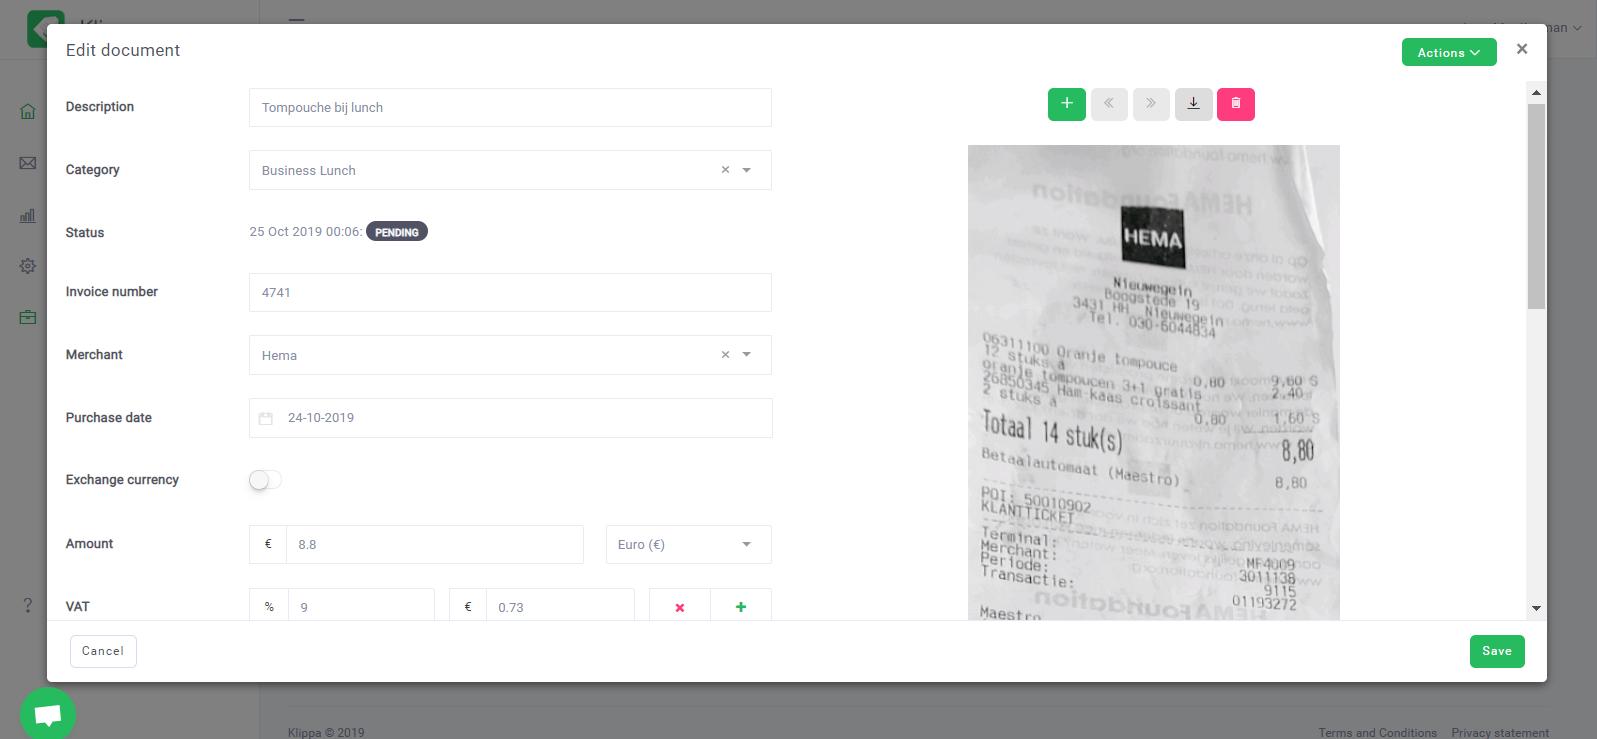 Klippa Software - Klippa edit documents